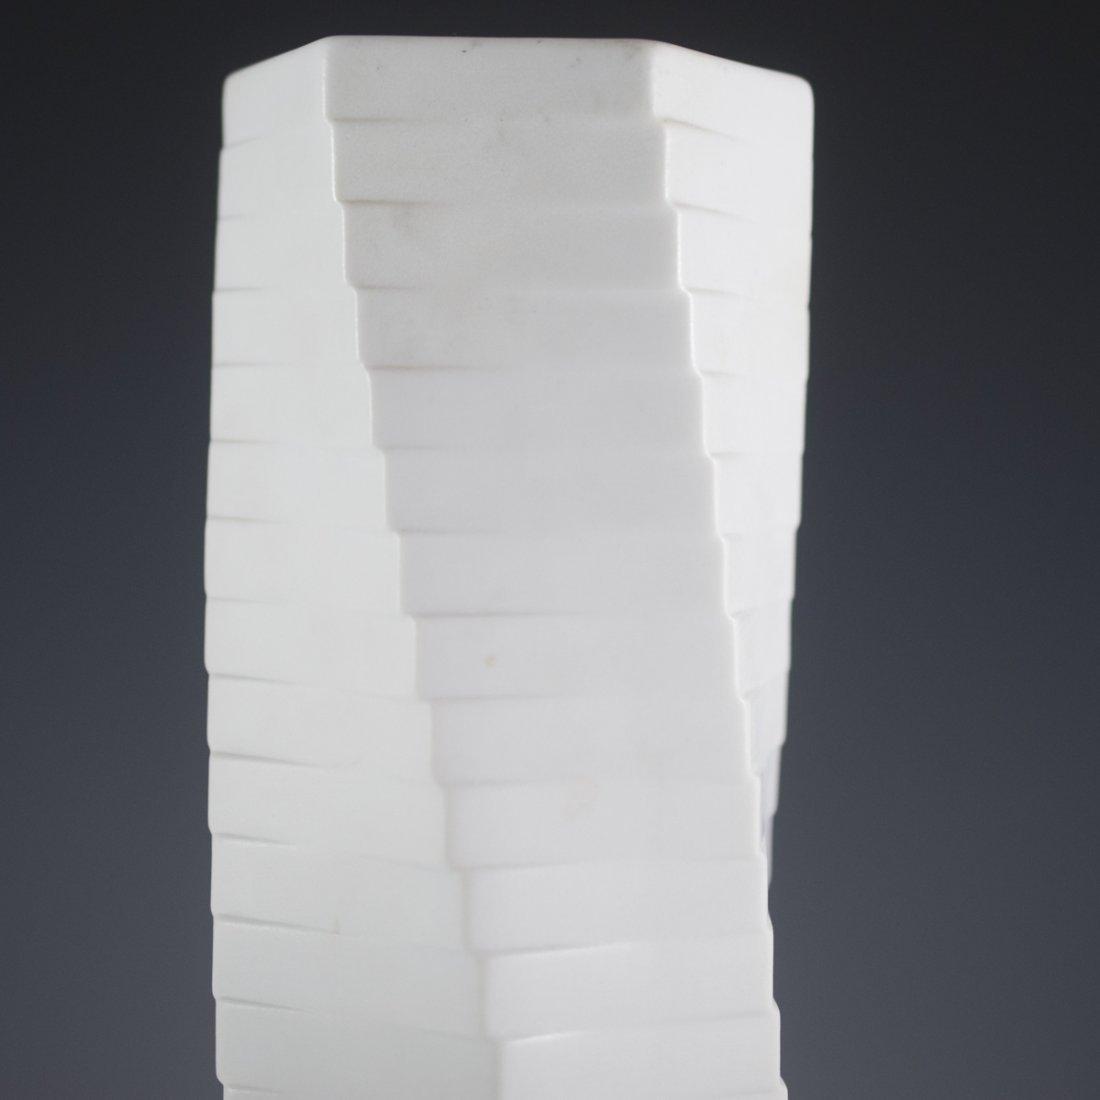 Rosenthal Studio Linie Matte Porcelain Vase - 2